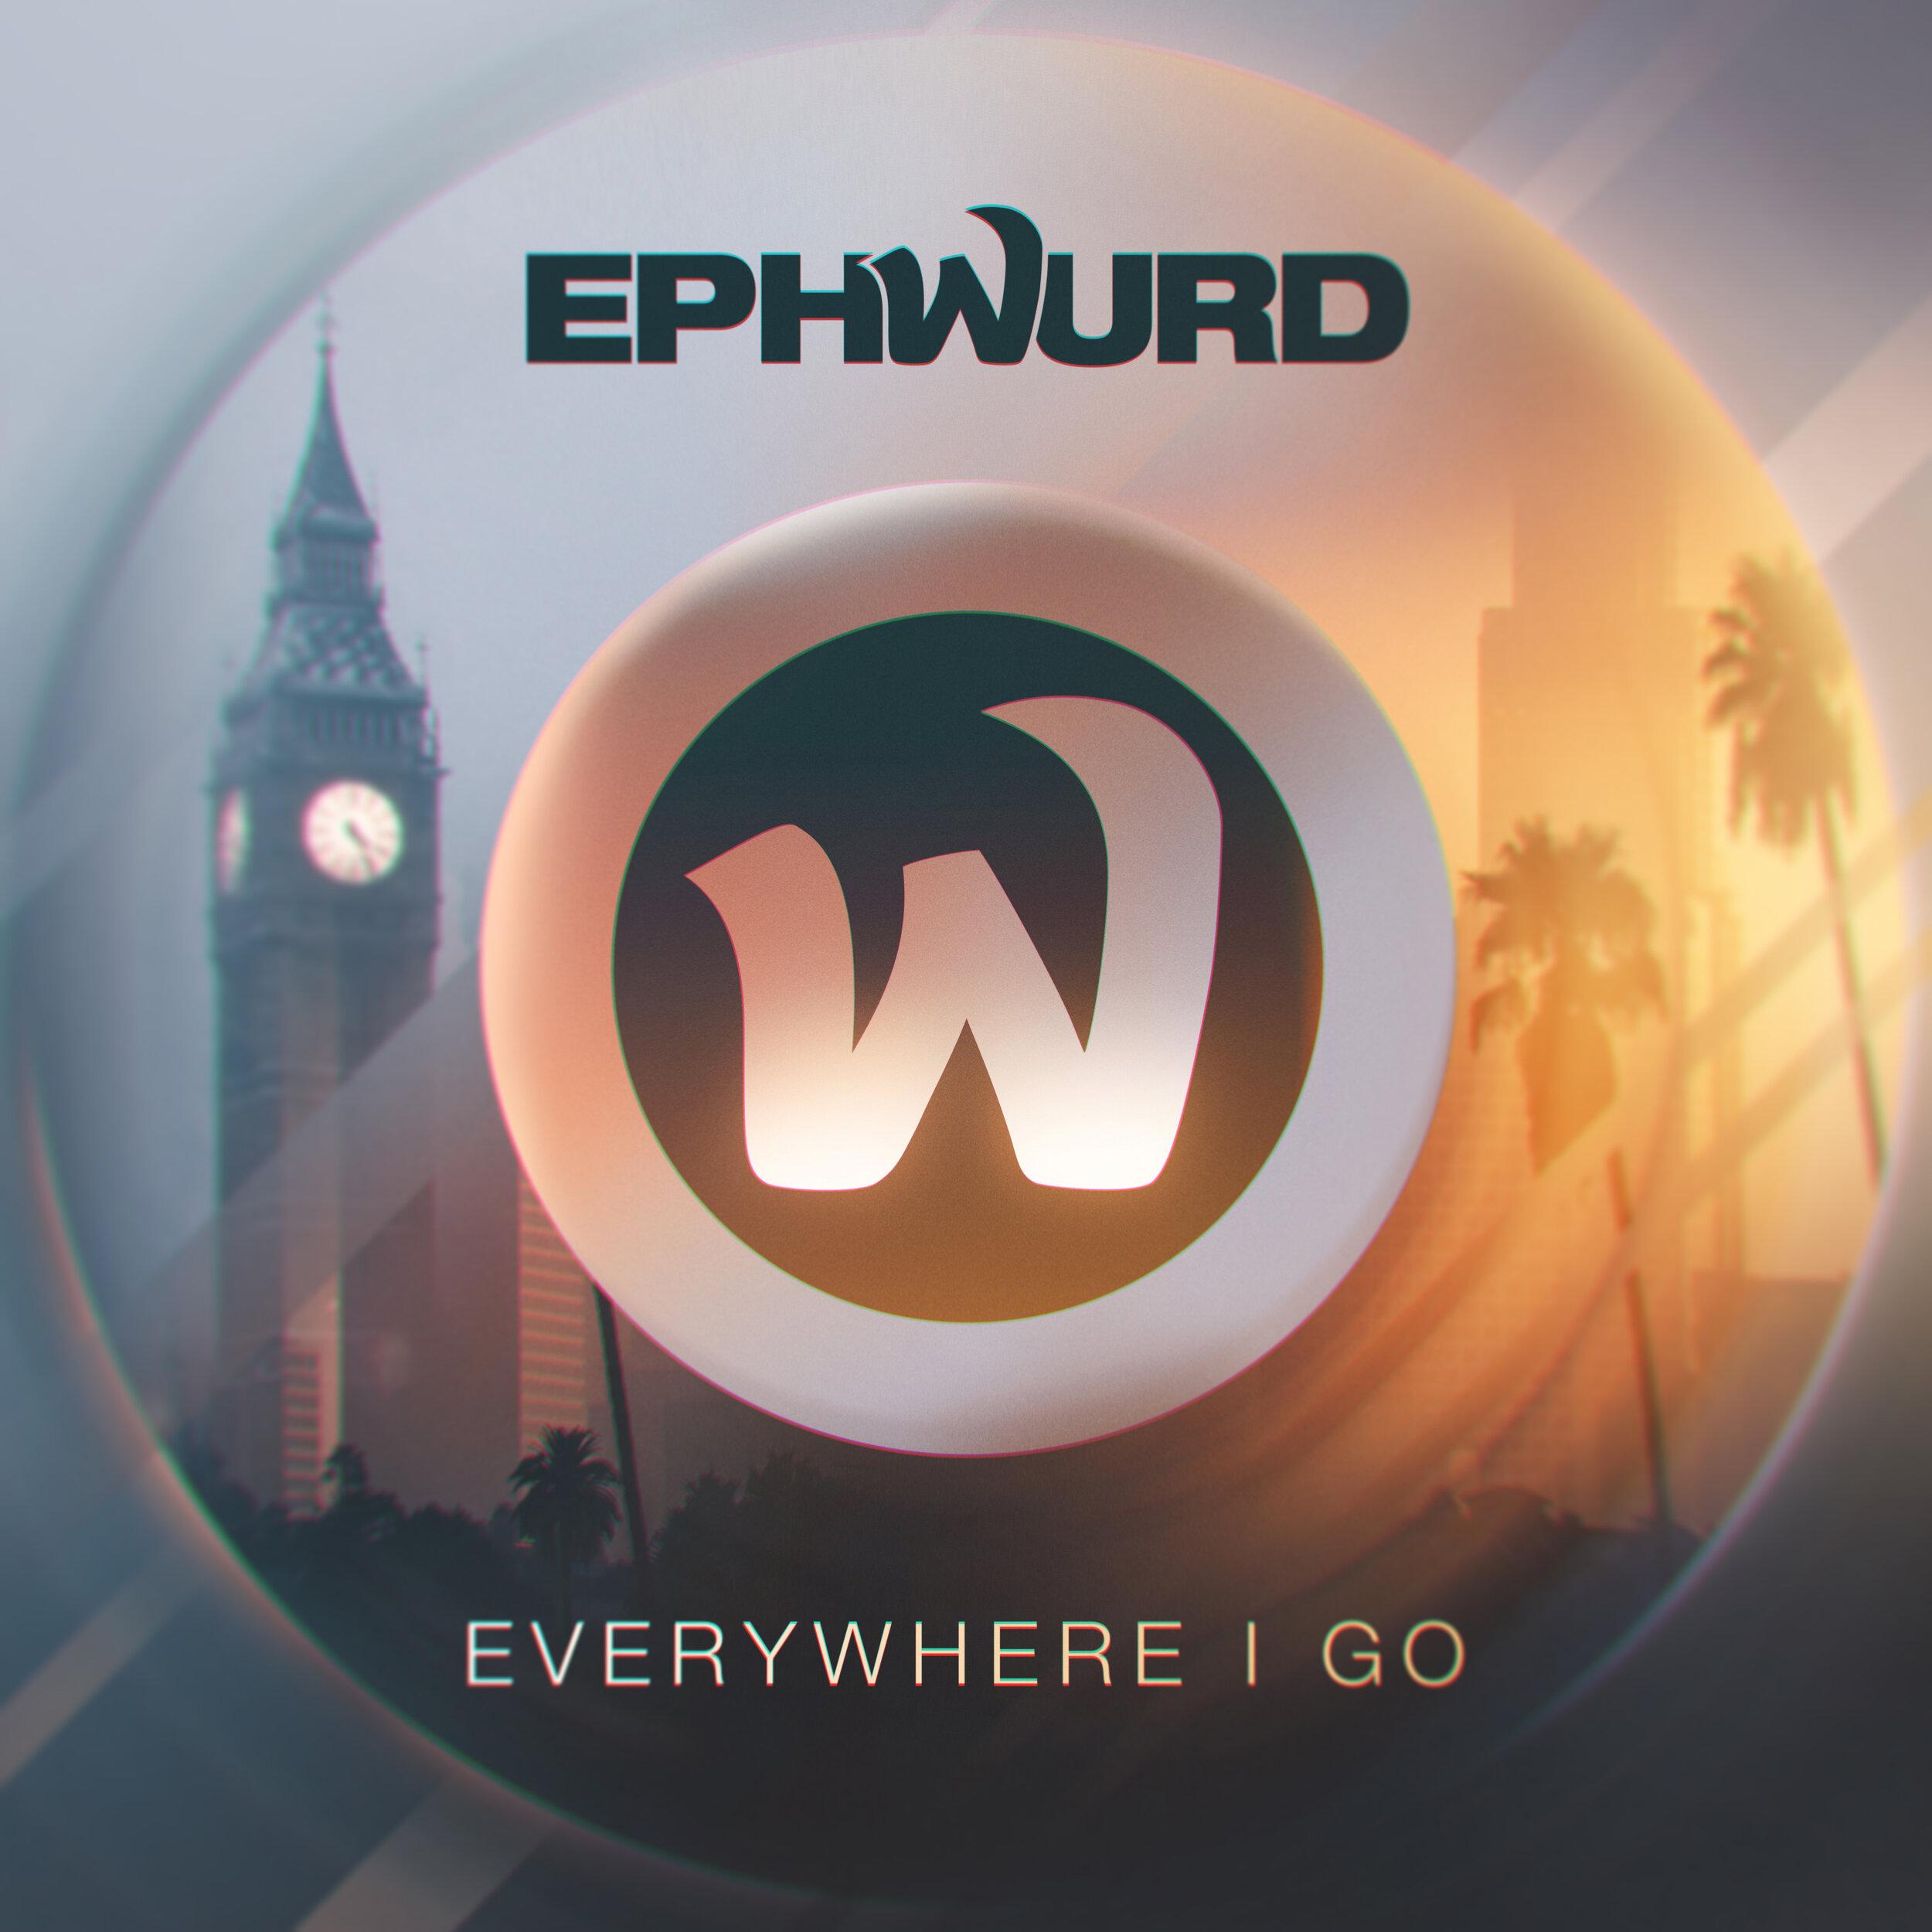 ephwurd_everywhere_I_go_art_3000px.jpg